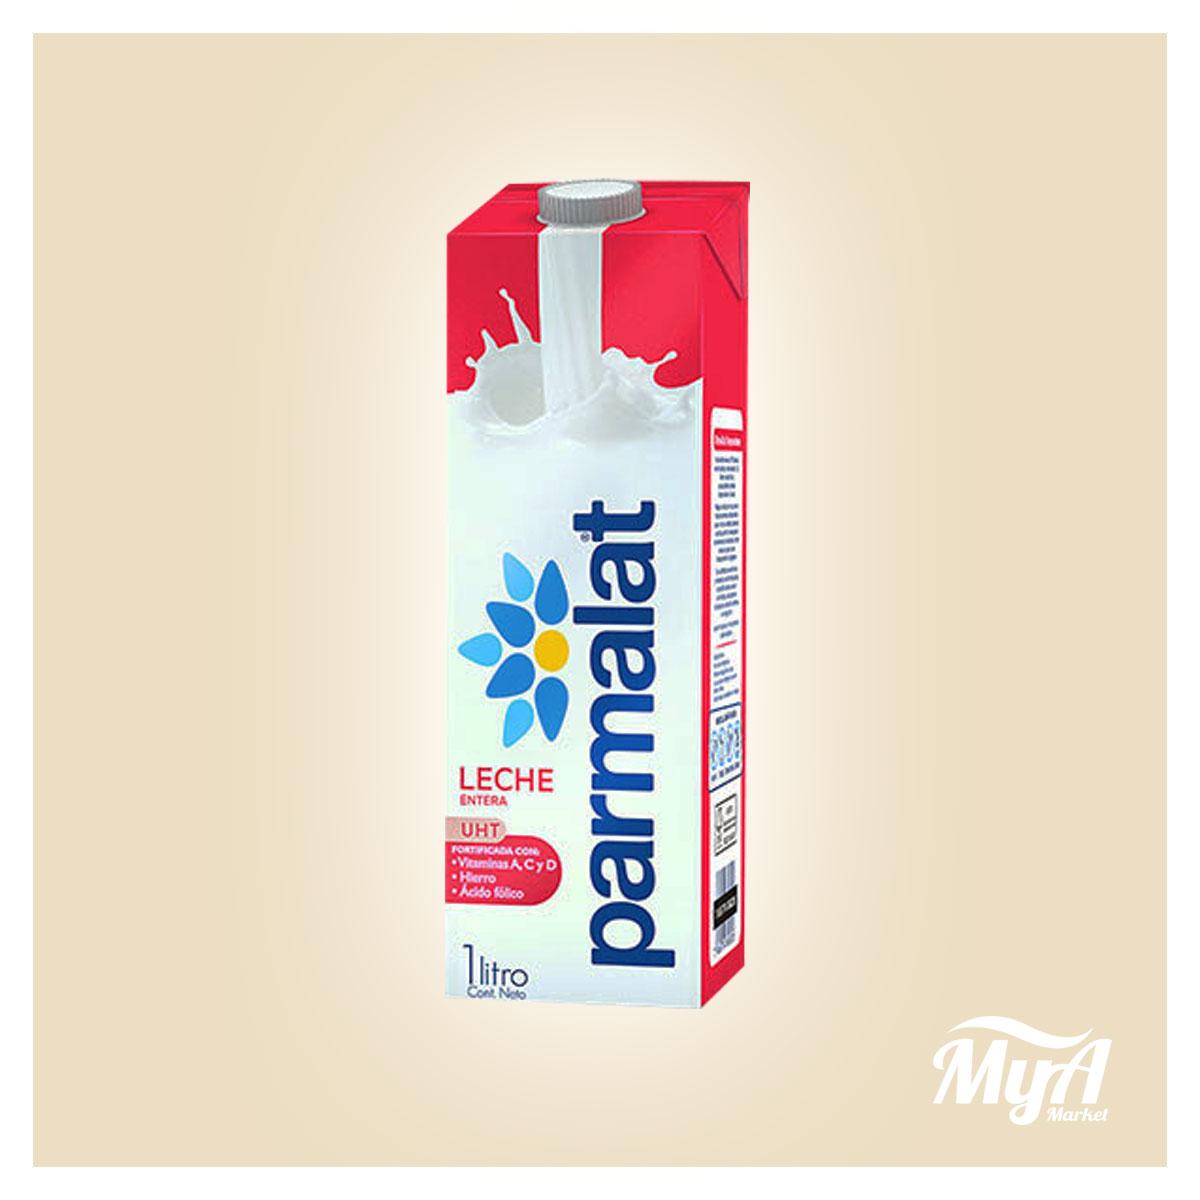 Leche Parmalat Entera 1lt